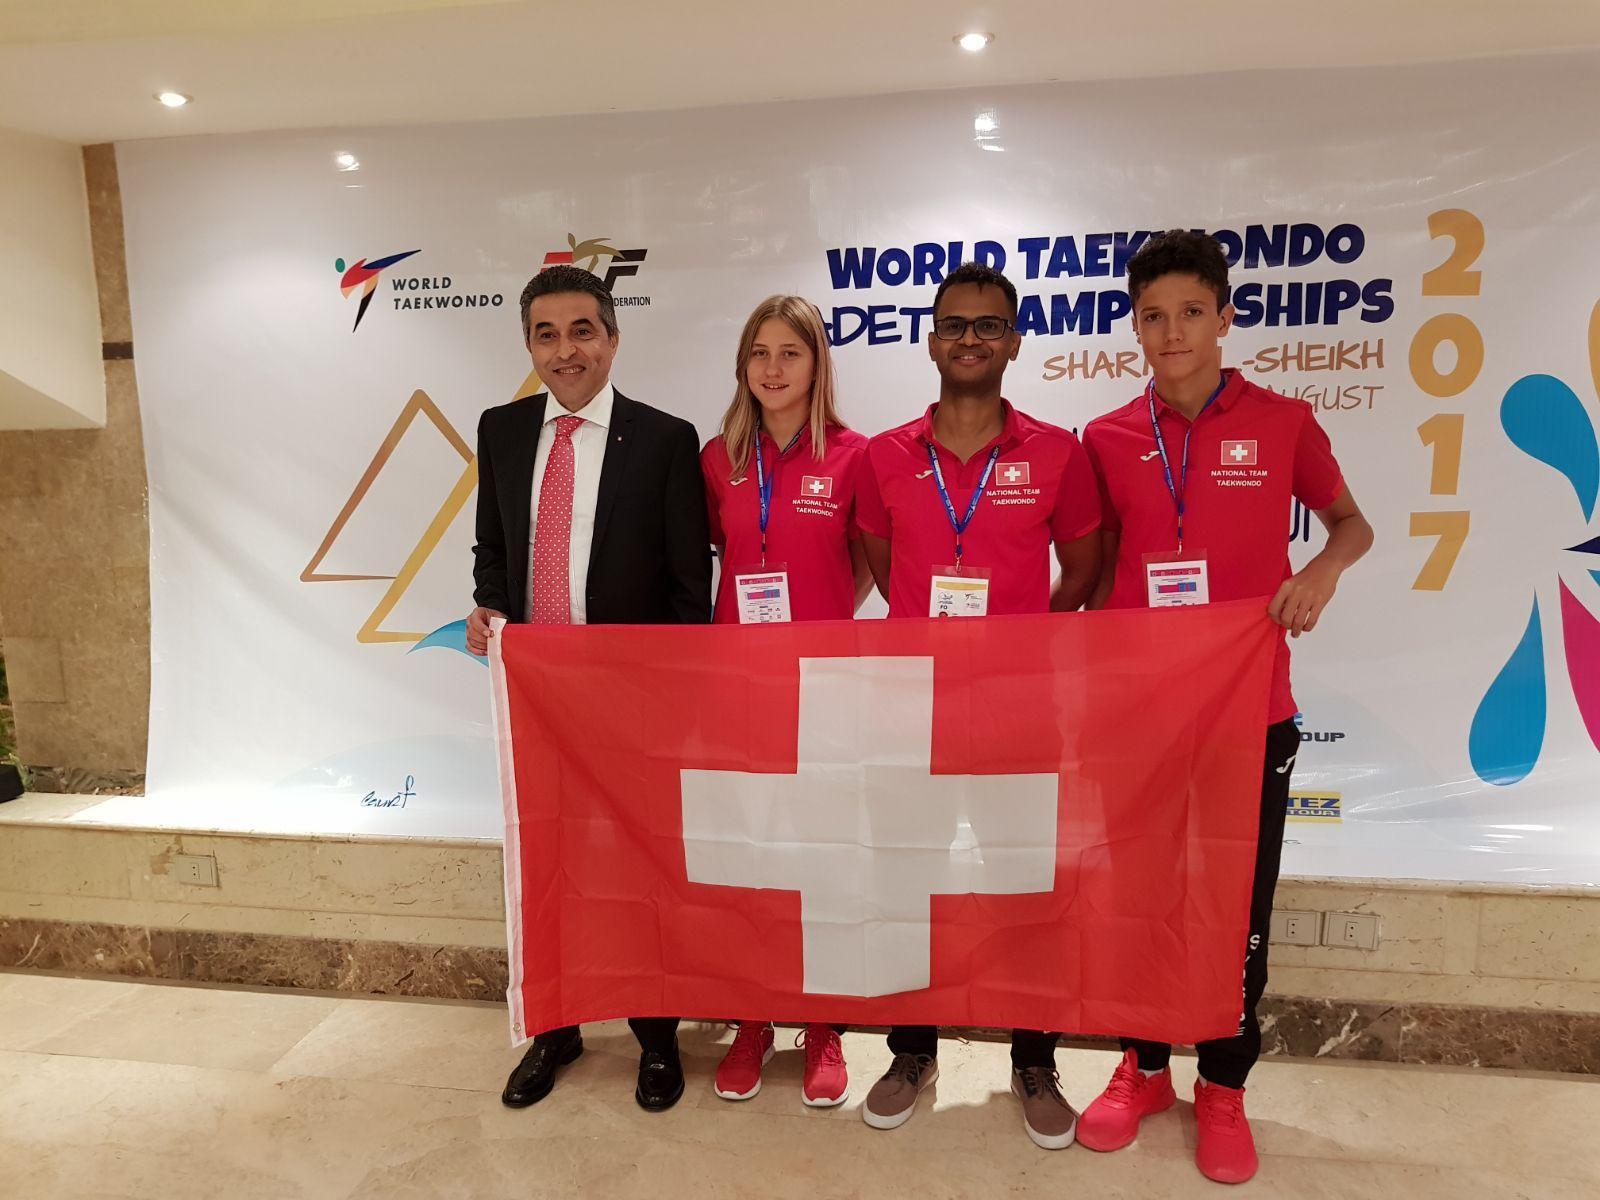 3rd WT World Taekwondo Cadet Championships, Sharm El-Sheikh, Egypt